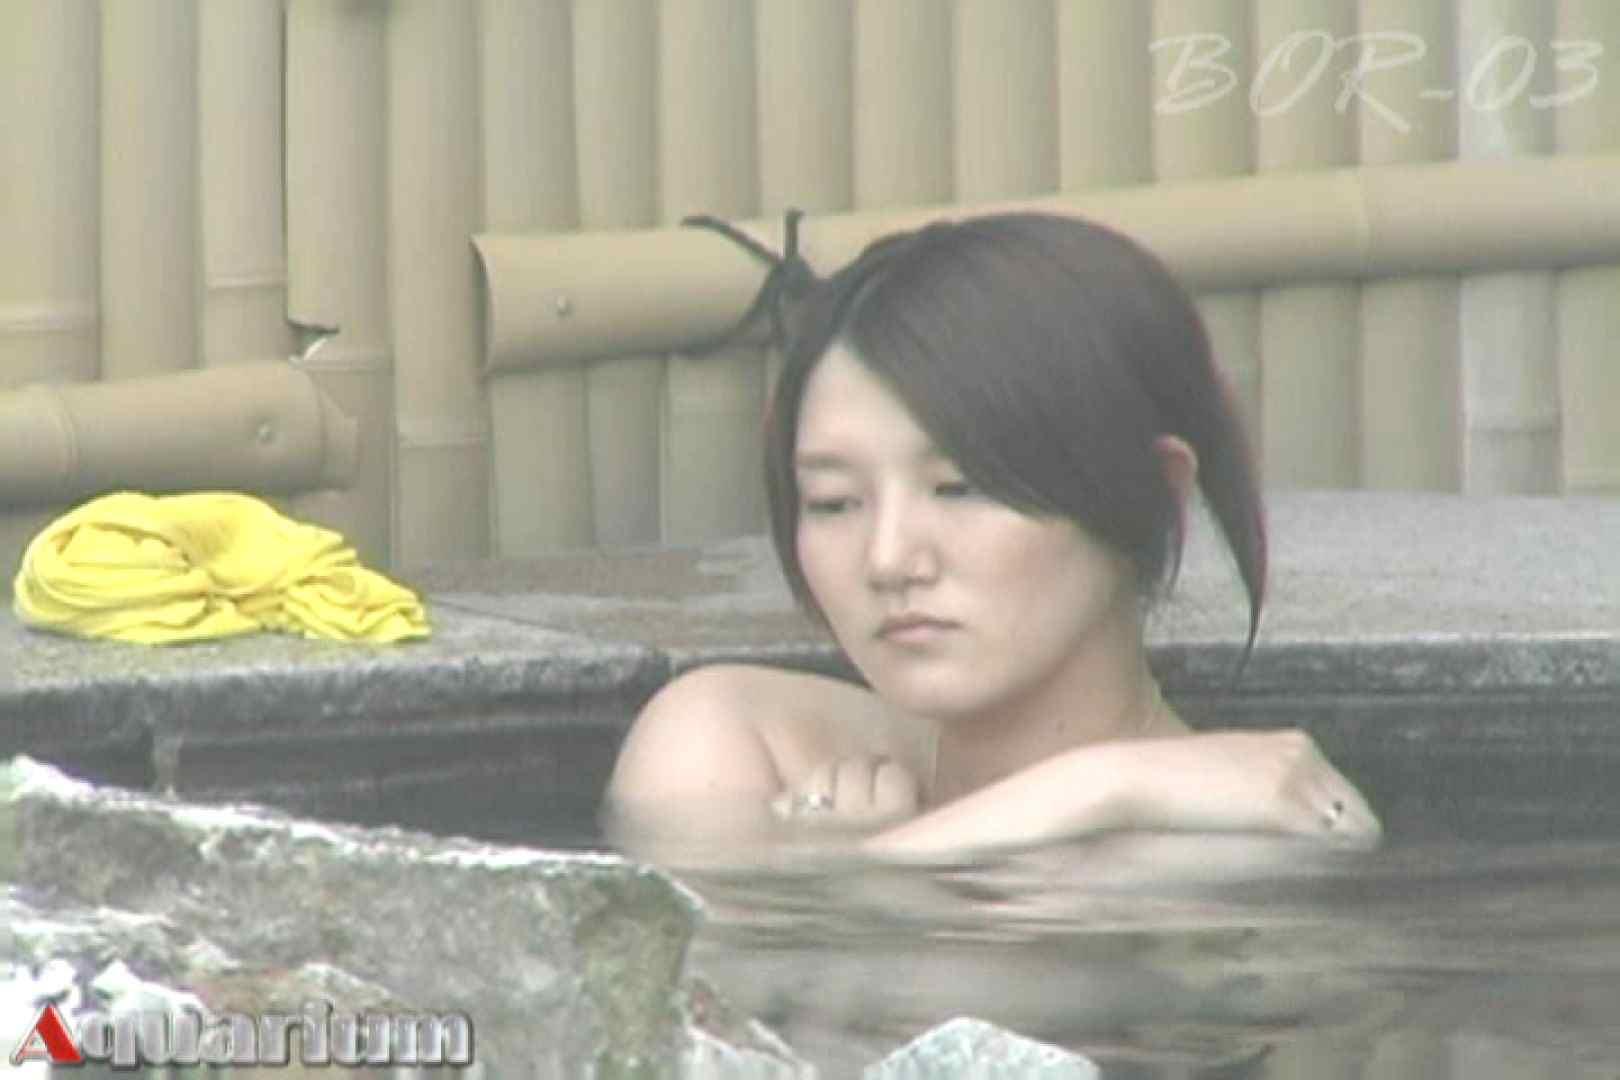 Aquaな露天風呂Vol.487 OLエロ画像 盗撮セックス無修正動画無料 42PICs 32